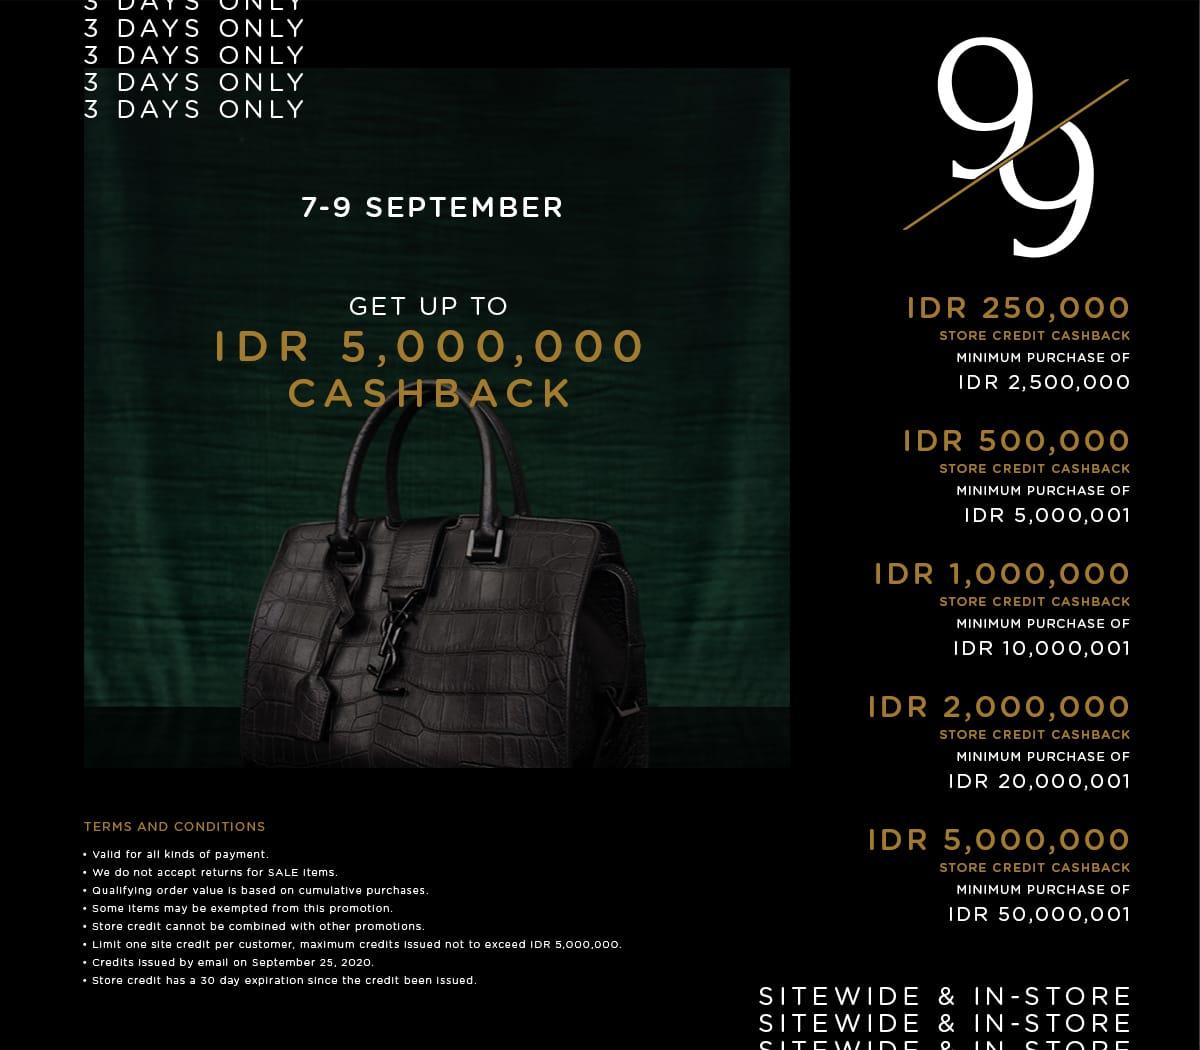 9.9 Cashback